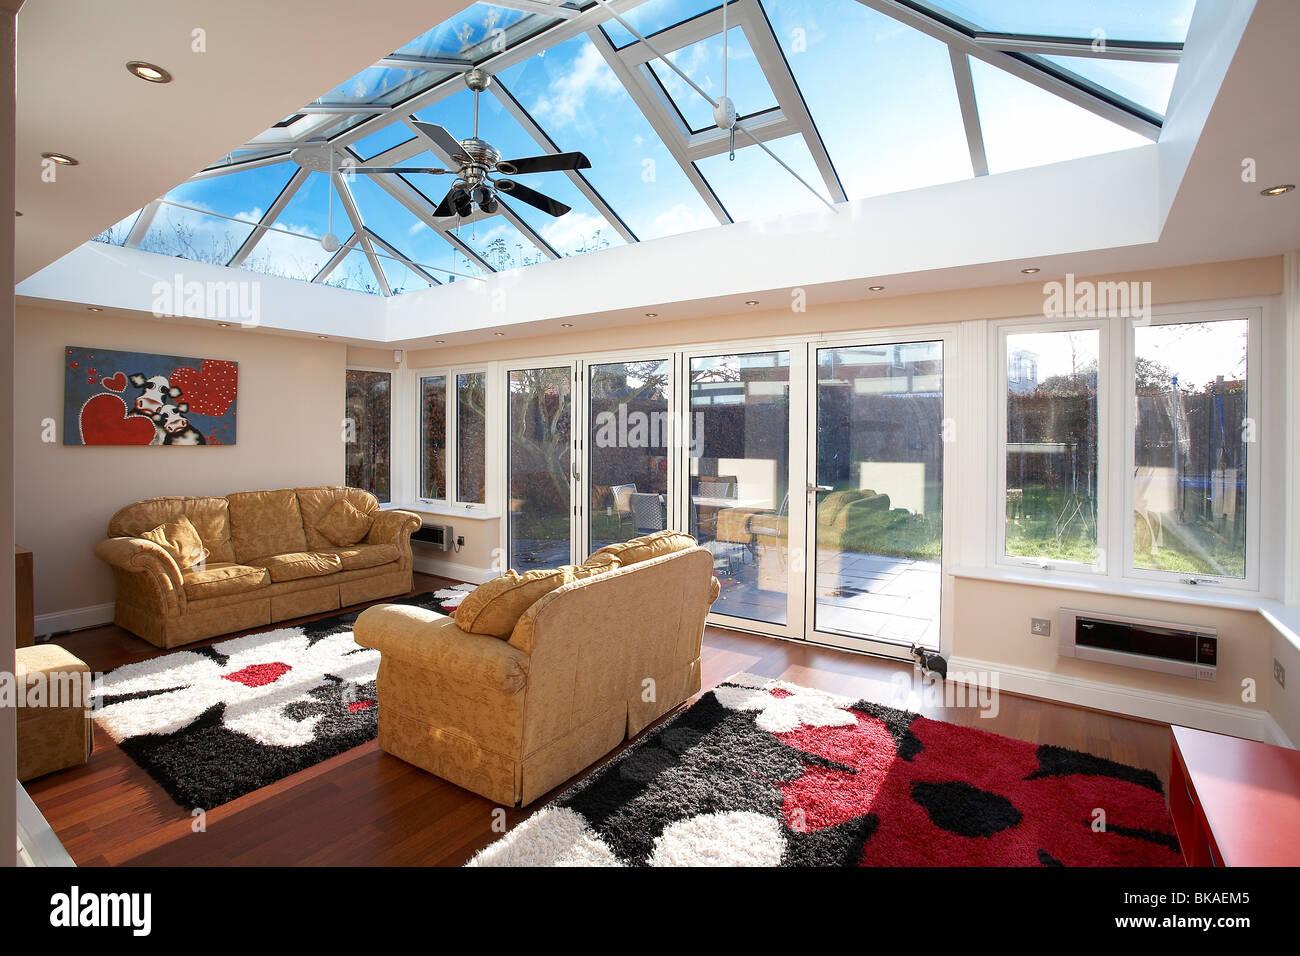 house orangery stockfotos house orangery bilder alamy. Black Bedroom Furniture Sets. Home Design Ideas